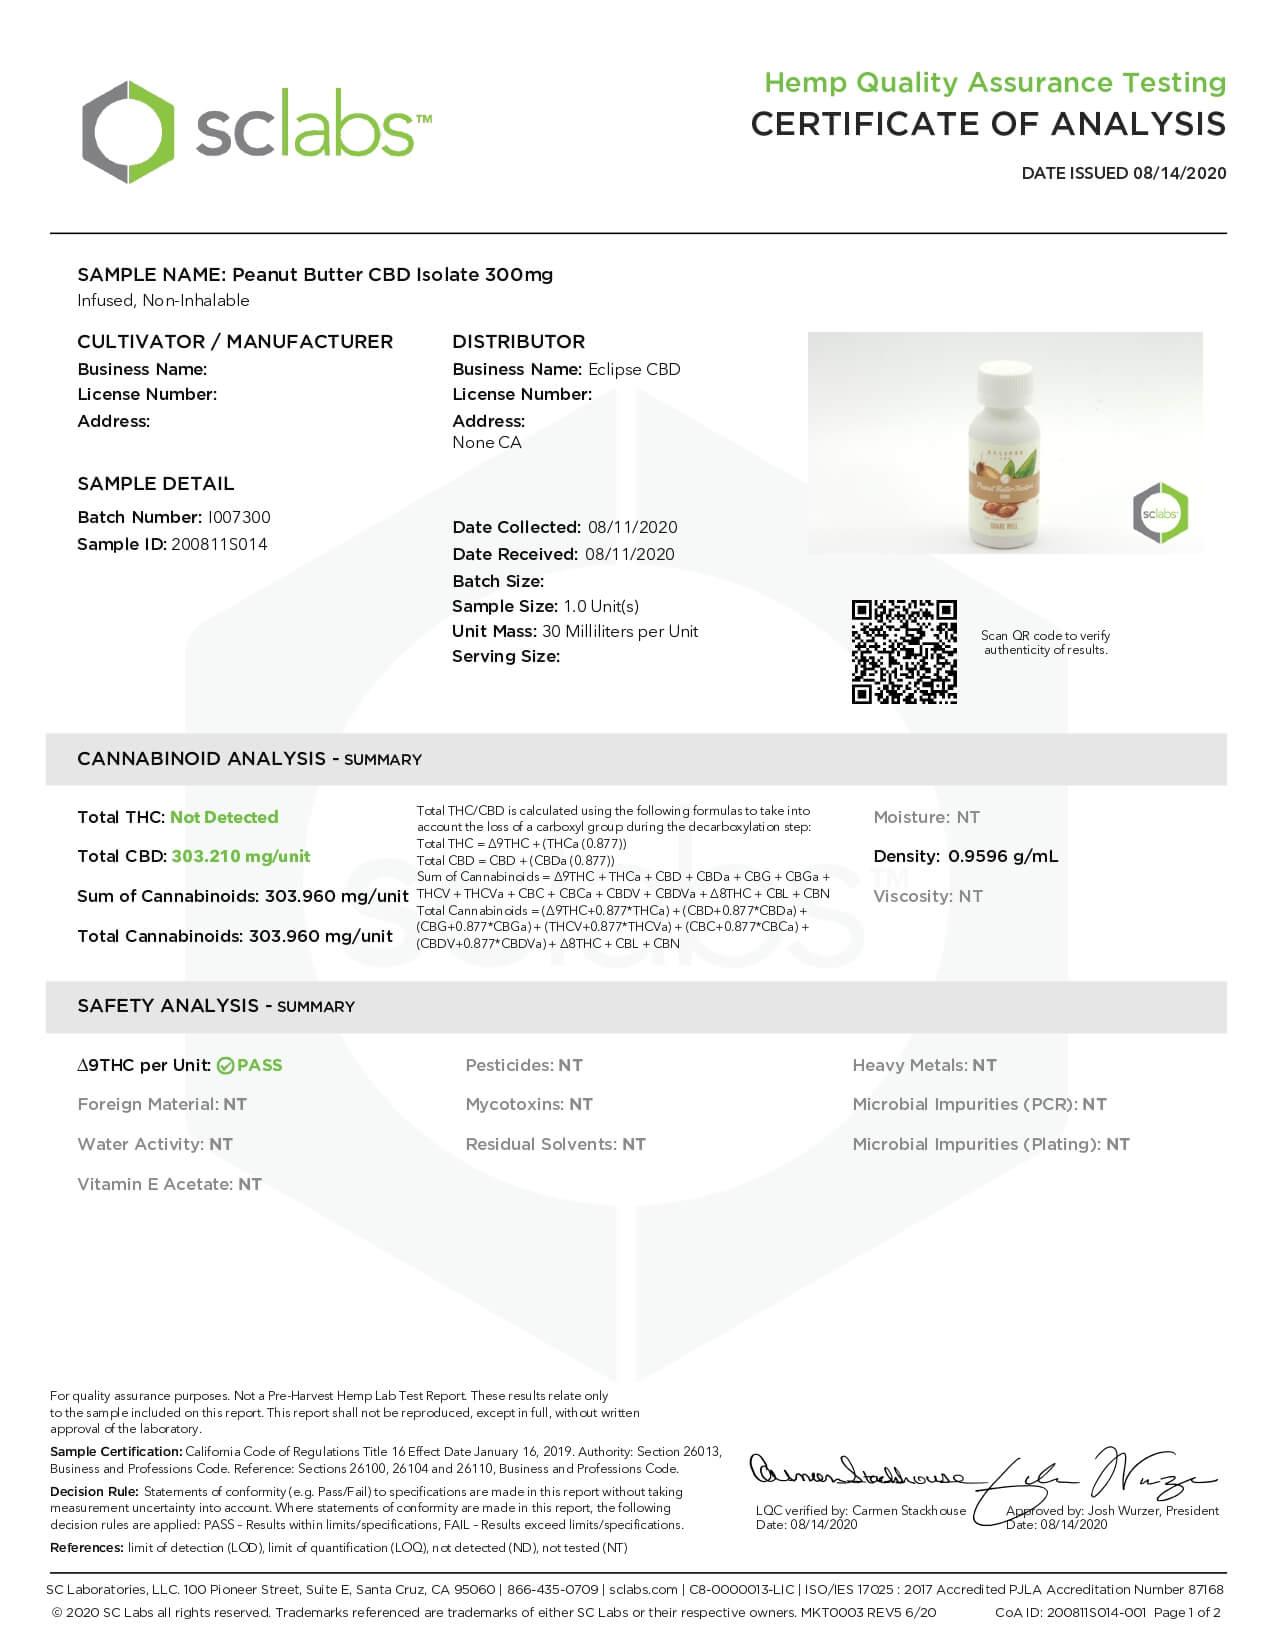 Eclipse CBD MCT Tincture Peanut Butter 300mg Lab Report